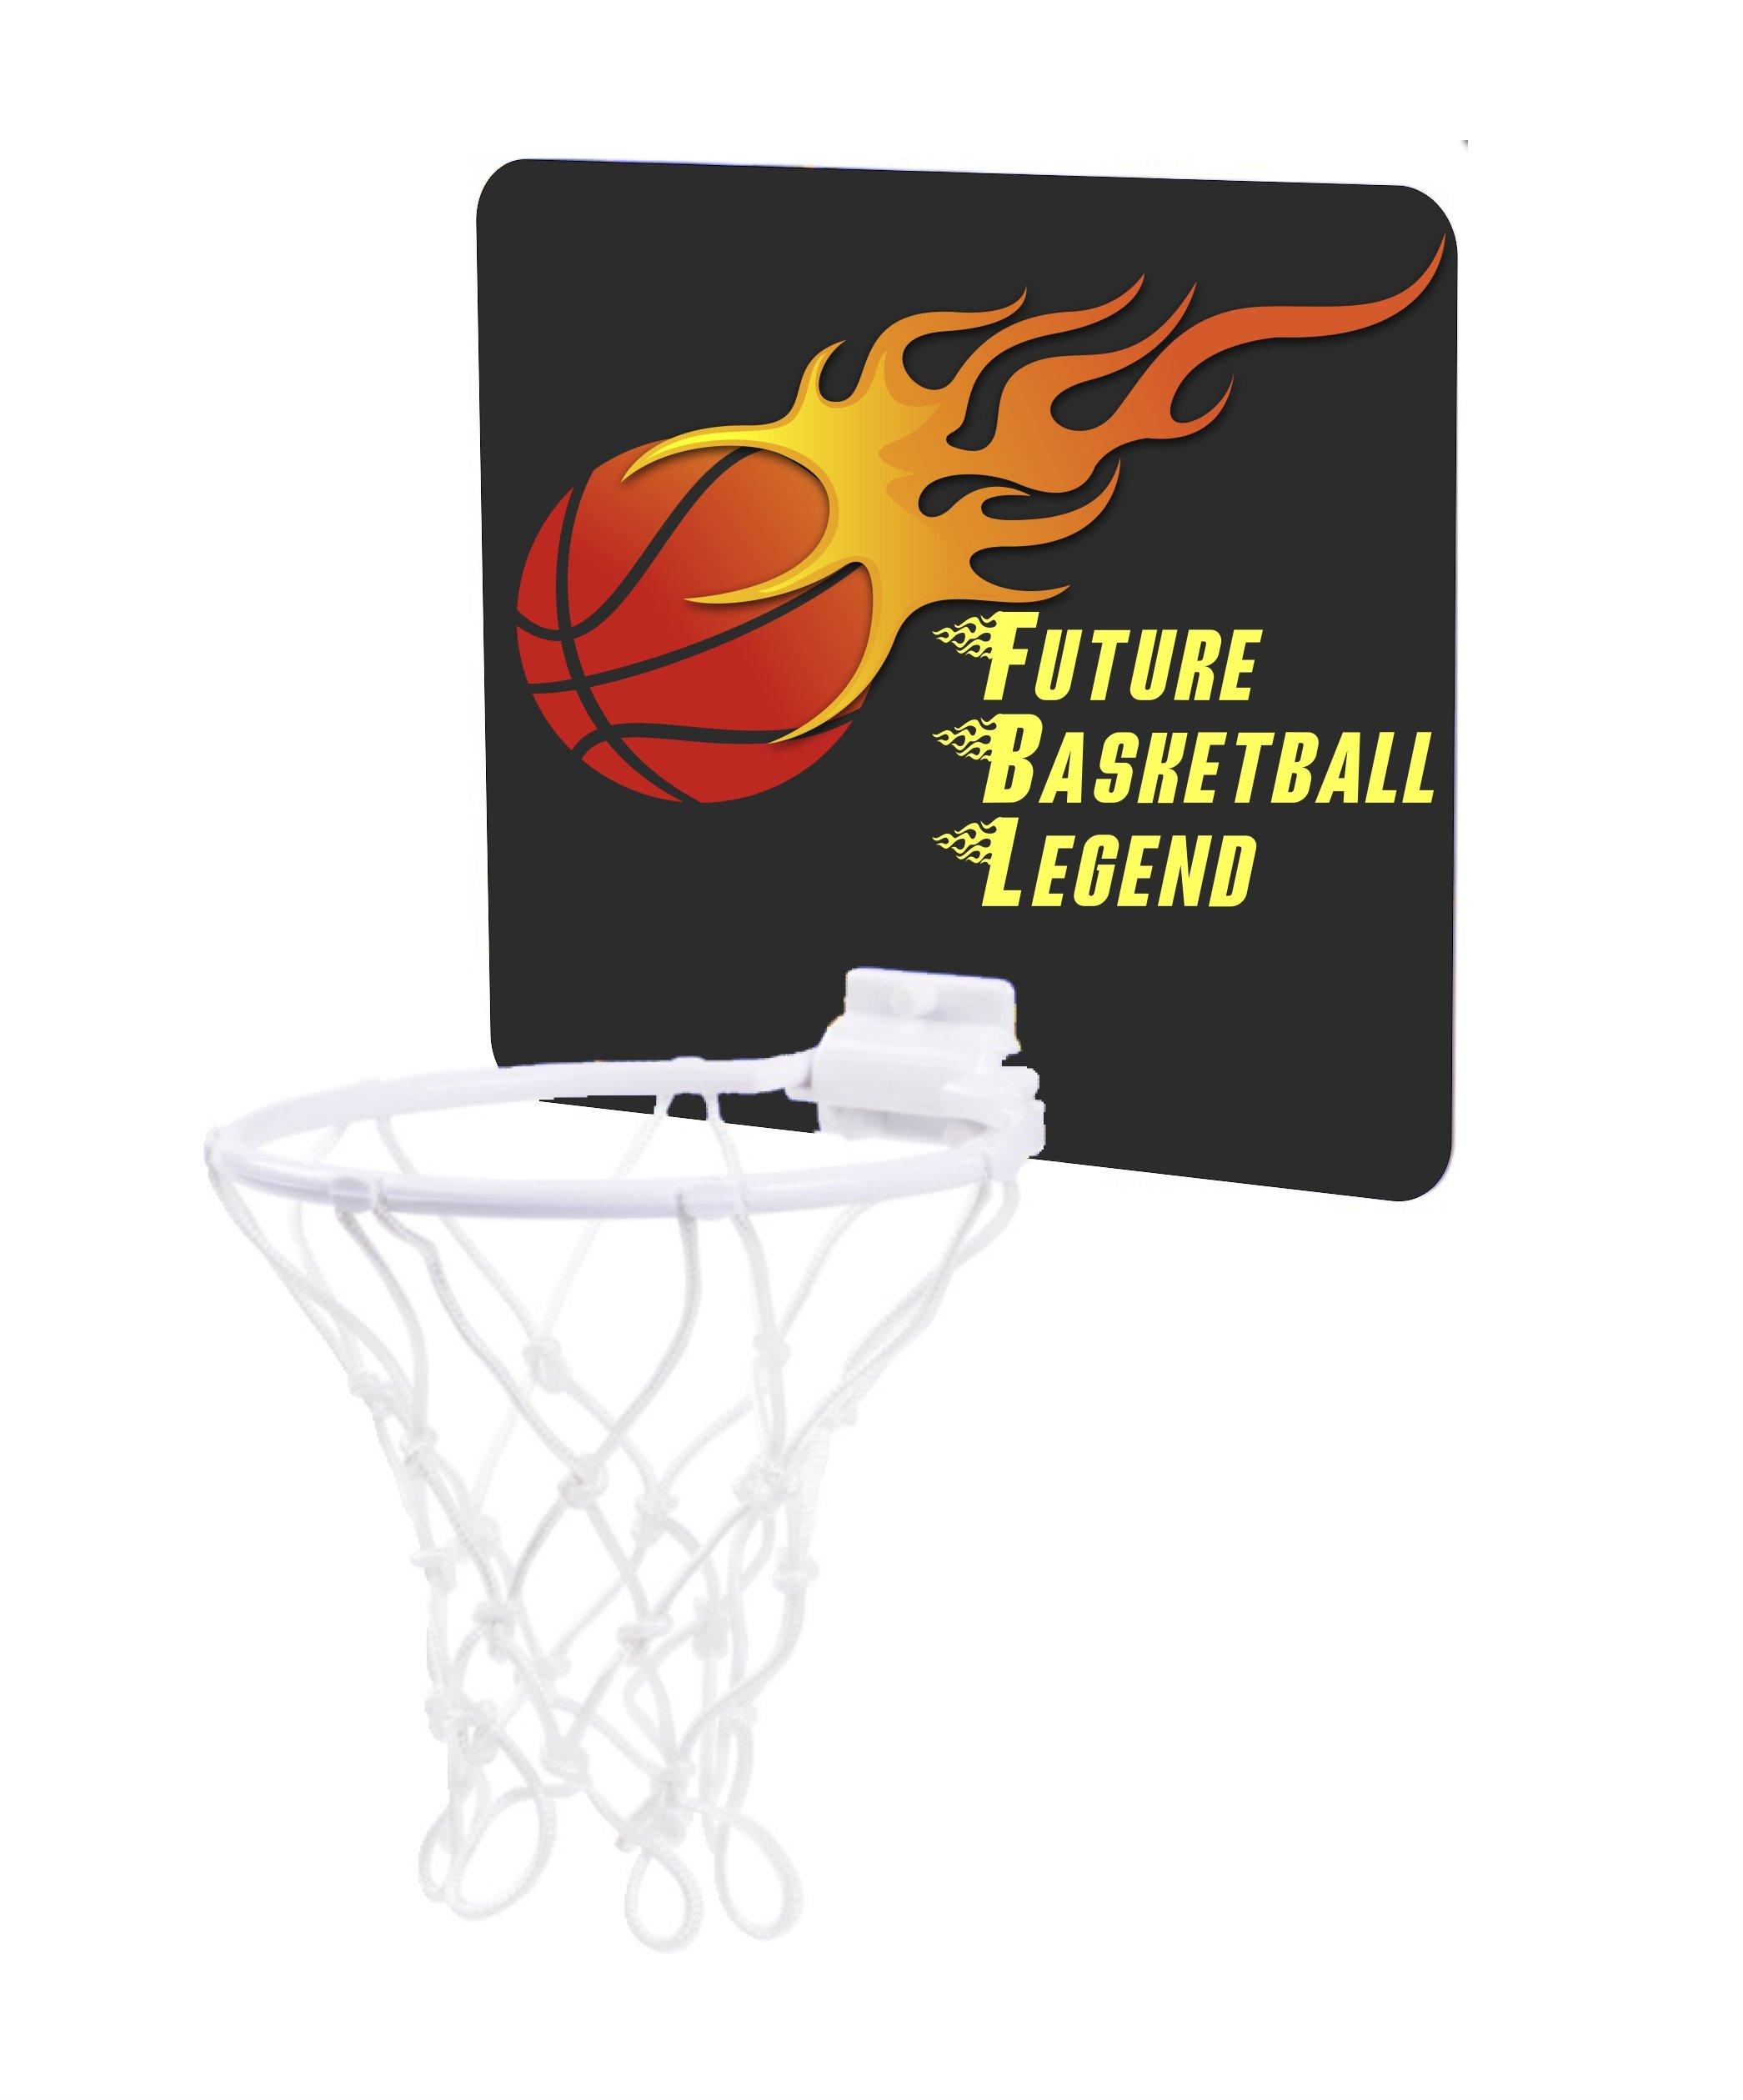 Jacks Outlet Flaming Basketball Design - Future Basketball Legend - Childrens 7.5'' x 9'' Mini Basketball Backboard - Goal with 6'' Hoop